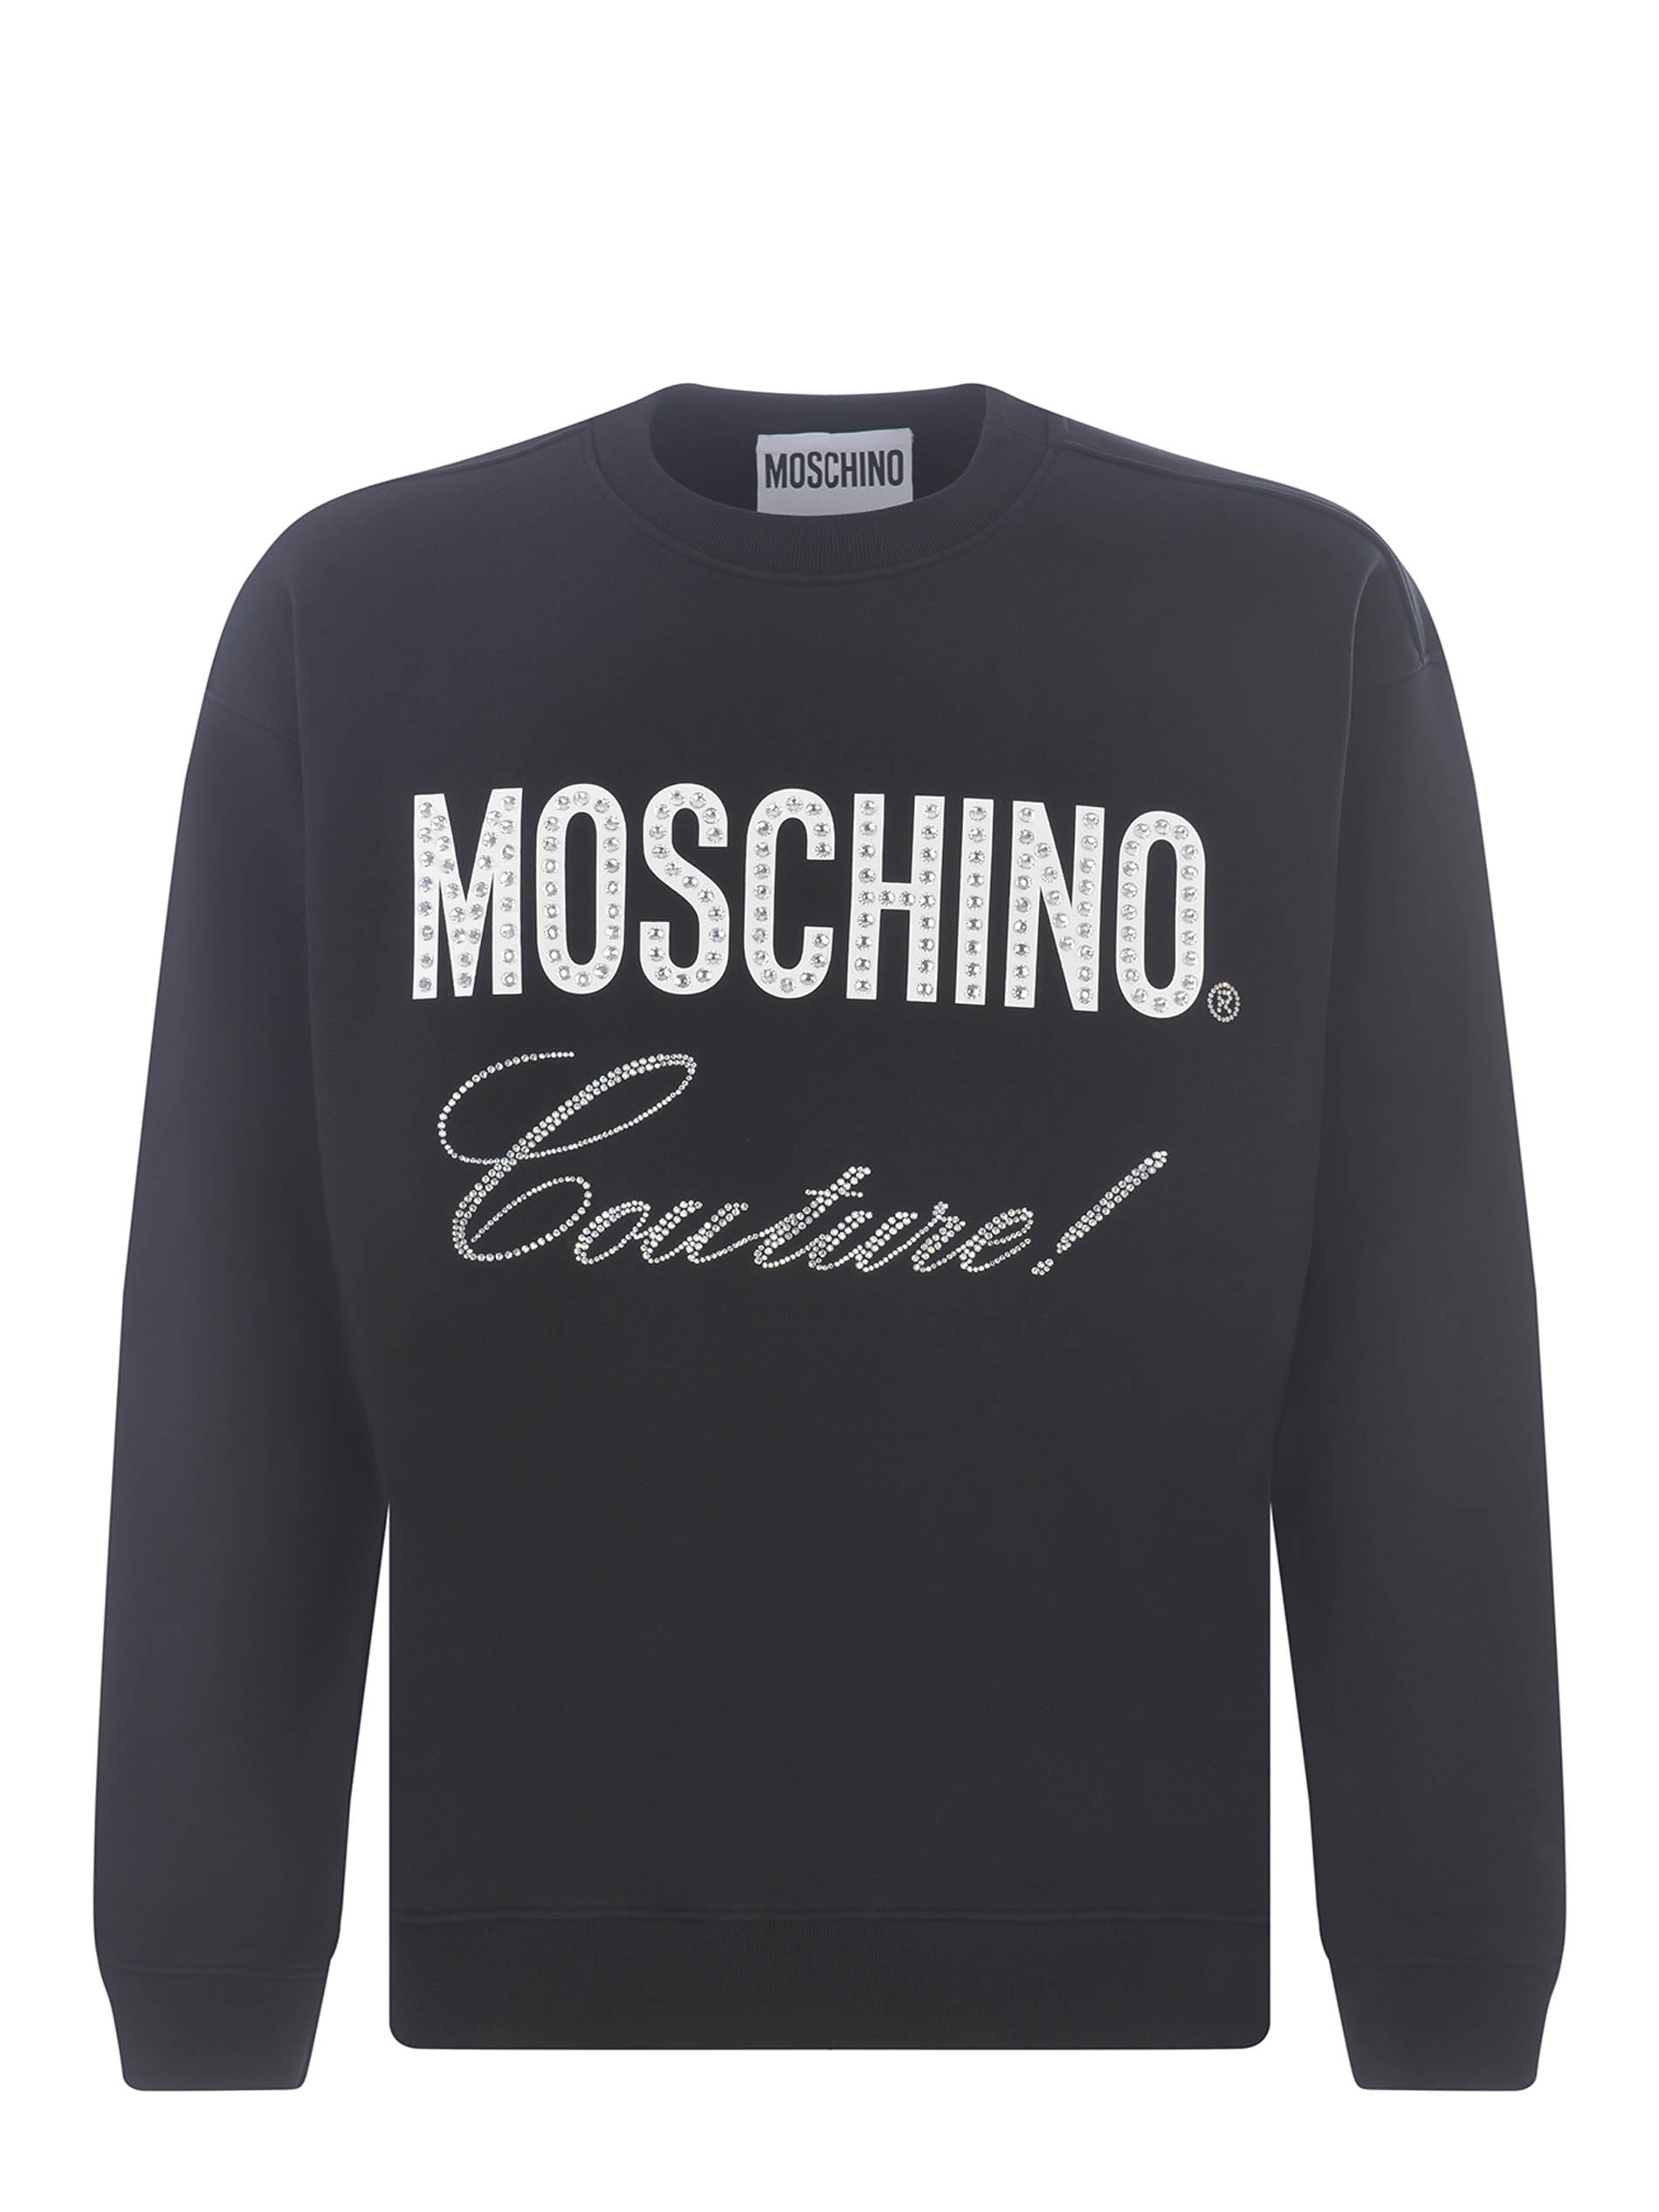 Felpa Moschino Couture in cotone MOSCHINO | 10000005 | A17017027-1555